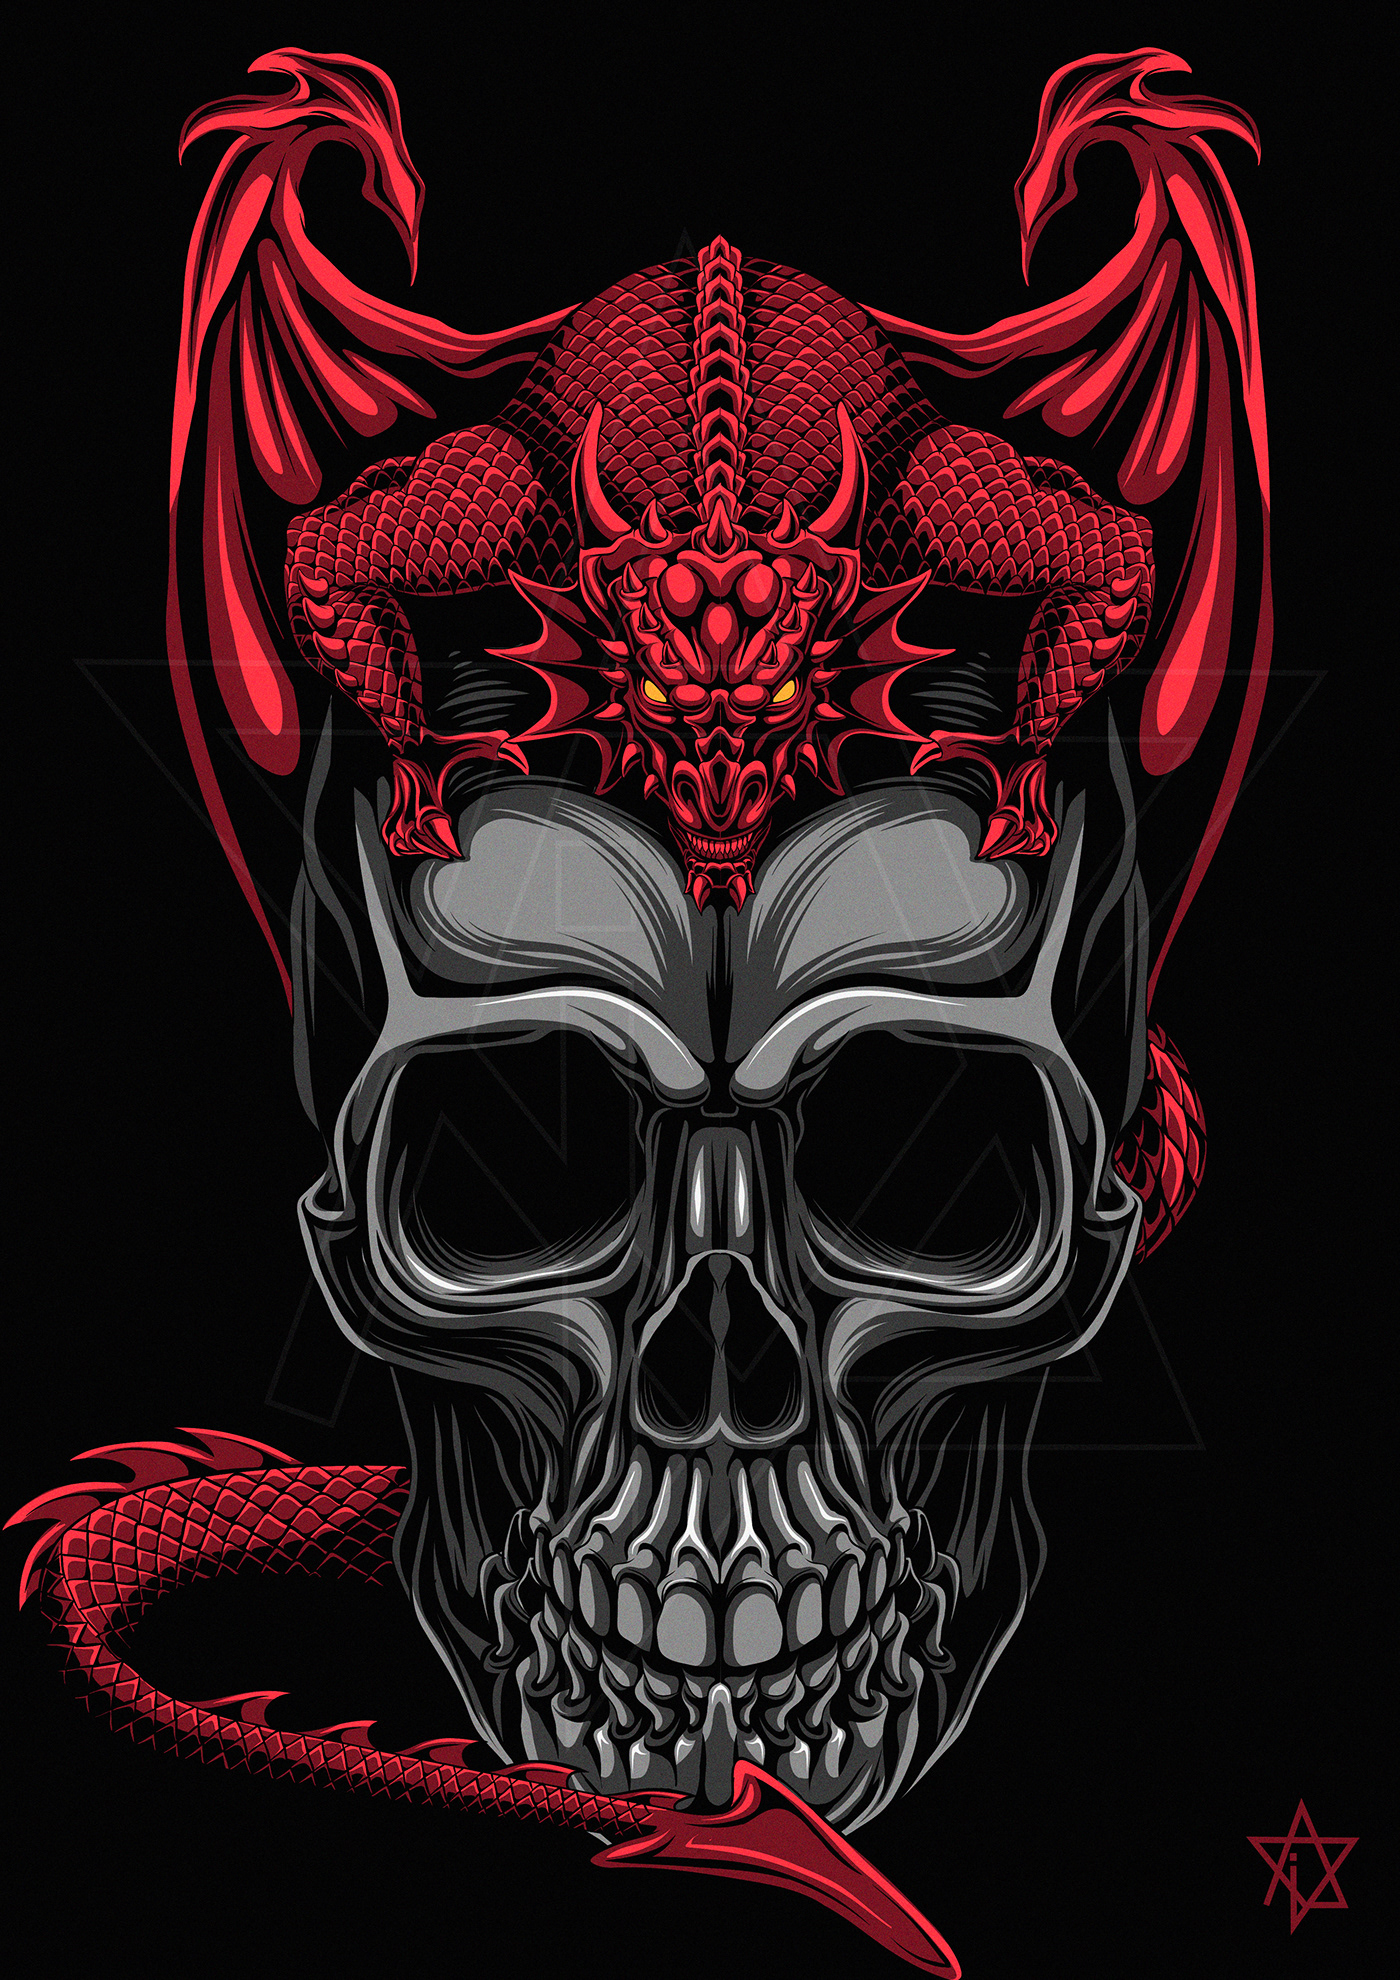 Image may contain: skull, cartoon and art